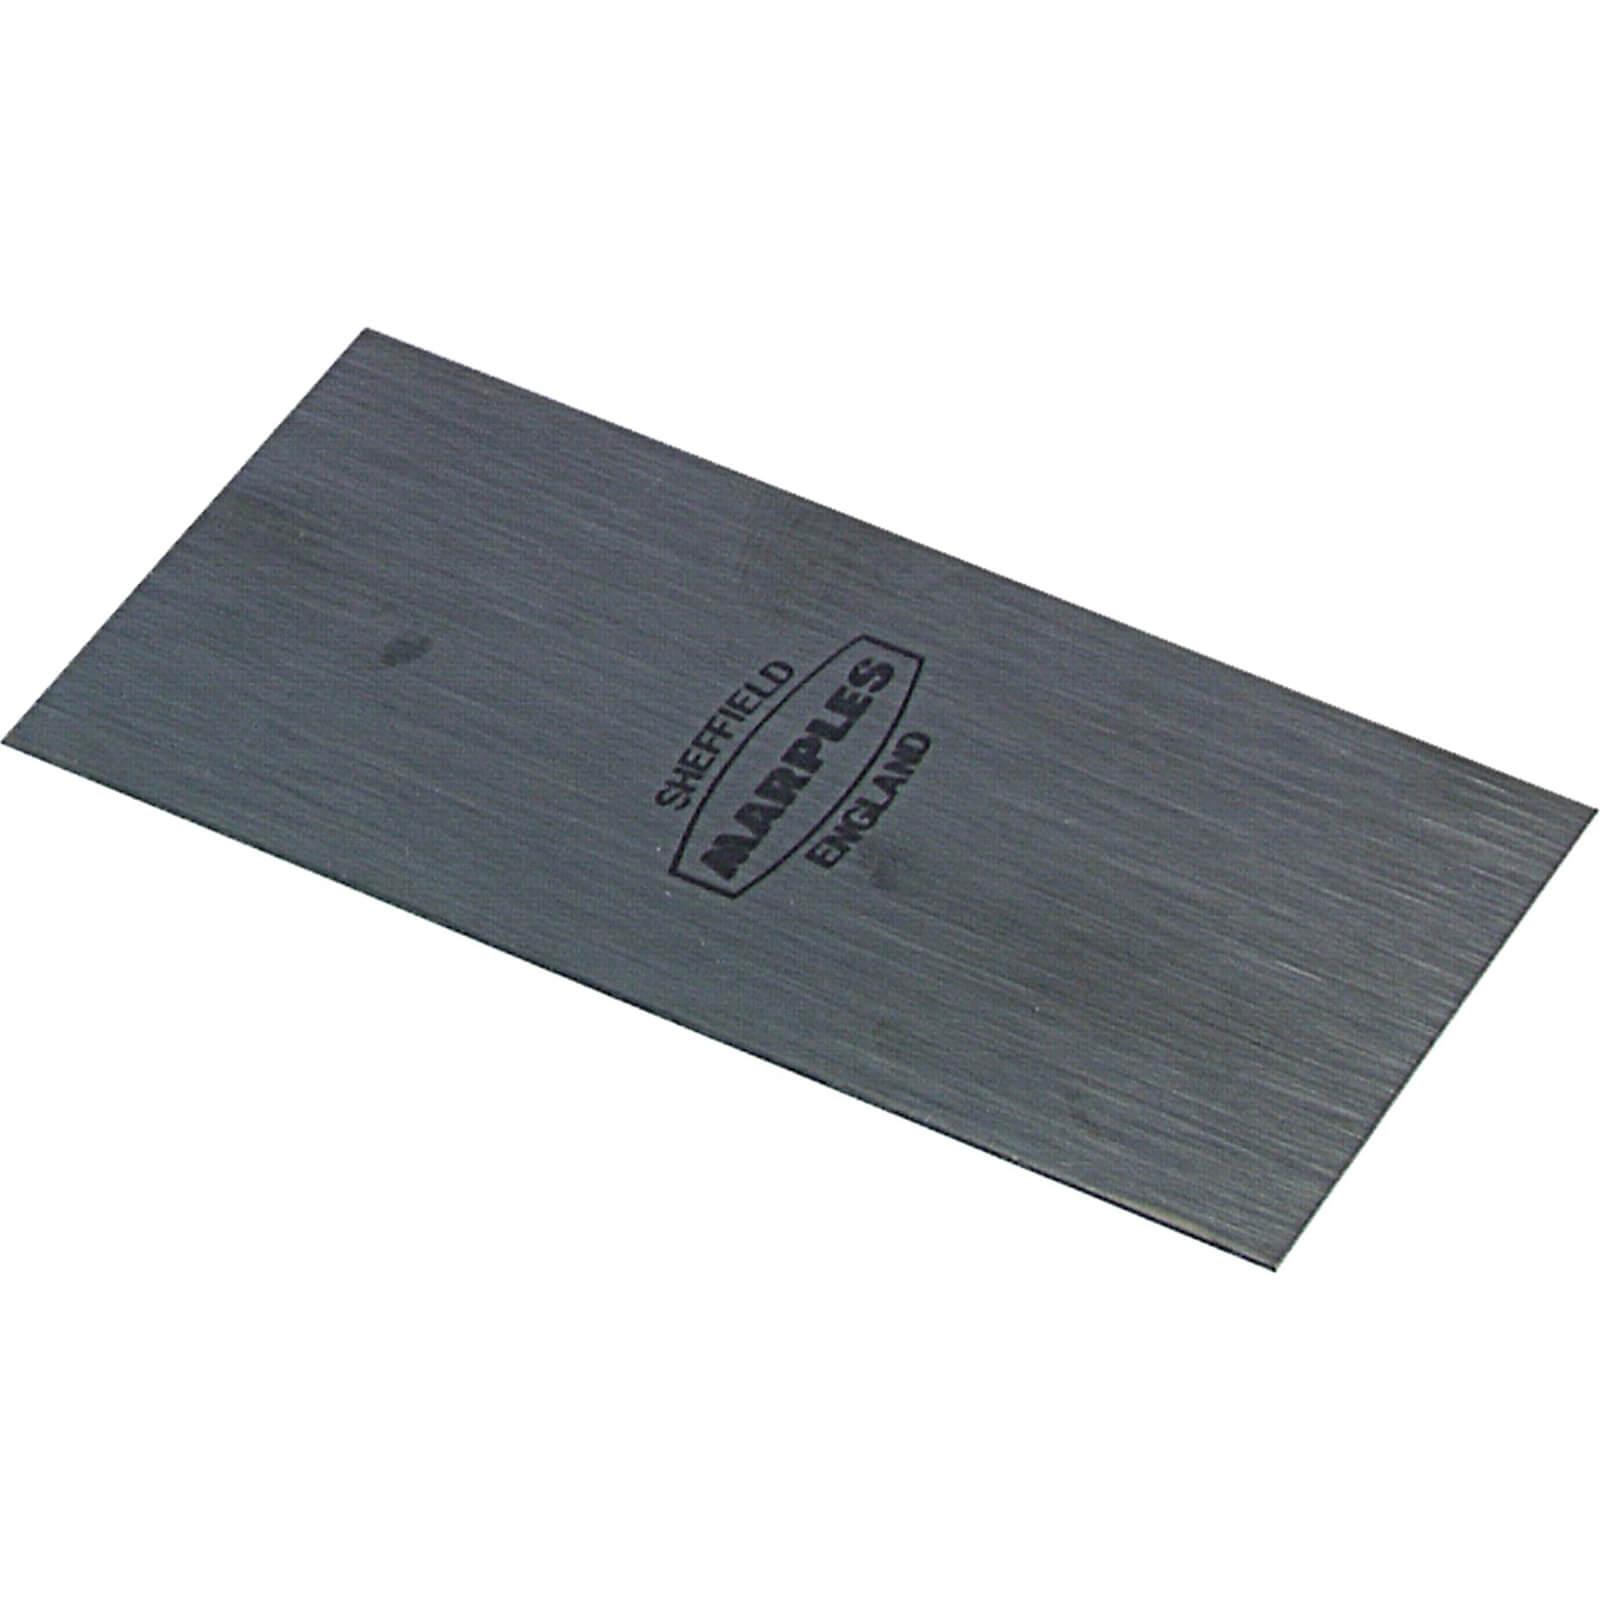 Marples Rectangular Cabinet Scraper 125mm